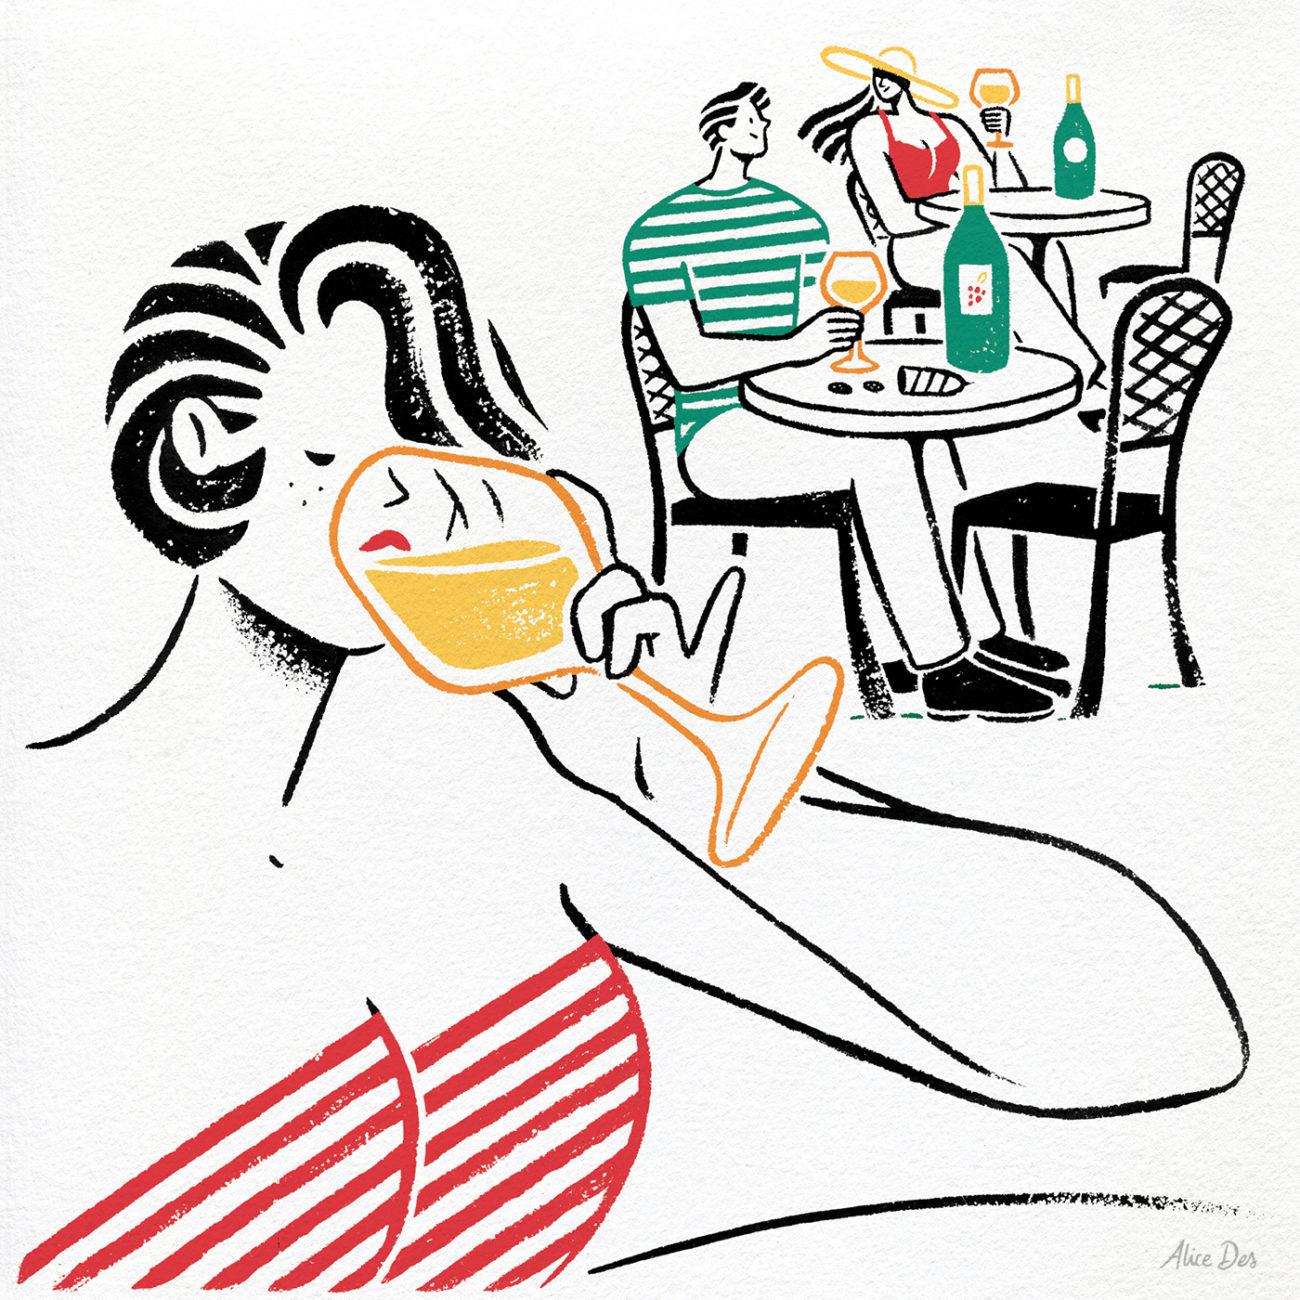 Alice Des – Les Echos – Vin Blanc